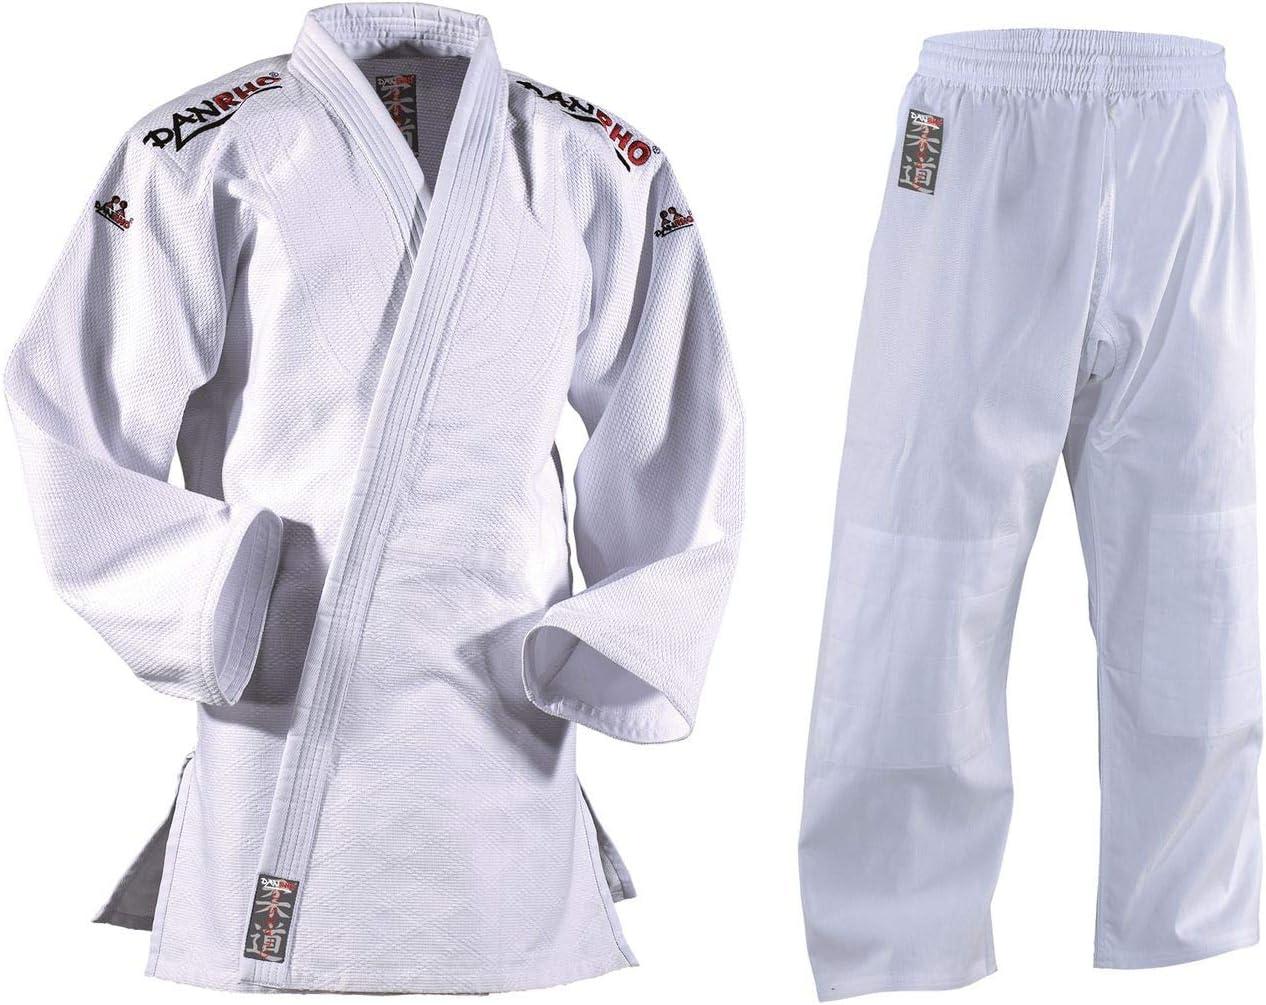 DanRho Traje de Judo Classic, Color Blanco - Blanco, tamaño 180 cm ...